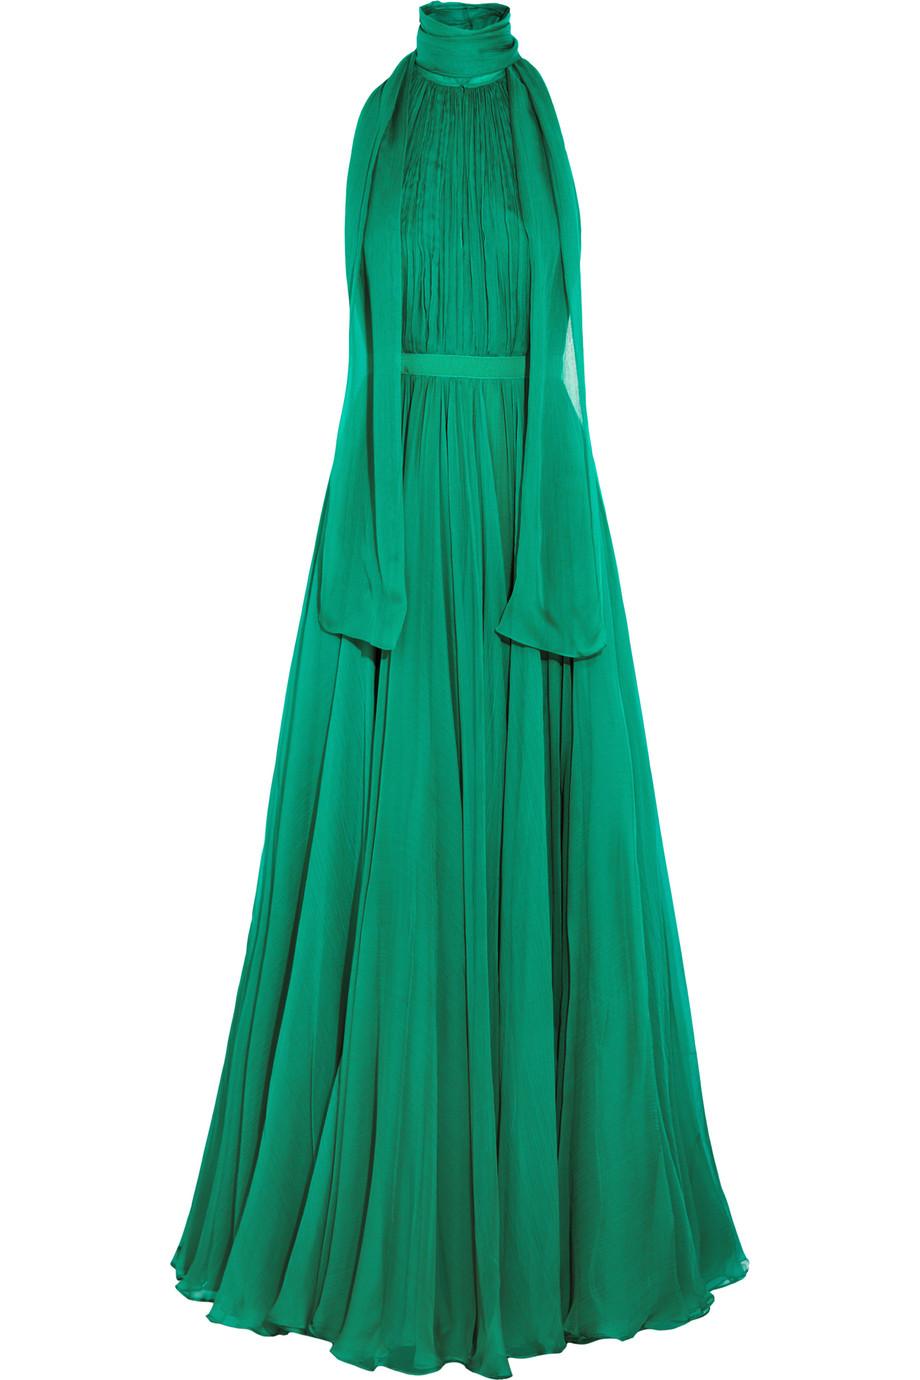 Alexander Mcqueen Crinkled Silk-Chiffon Halterneck Gown, Jade, Women's - Metallic, Size: 46